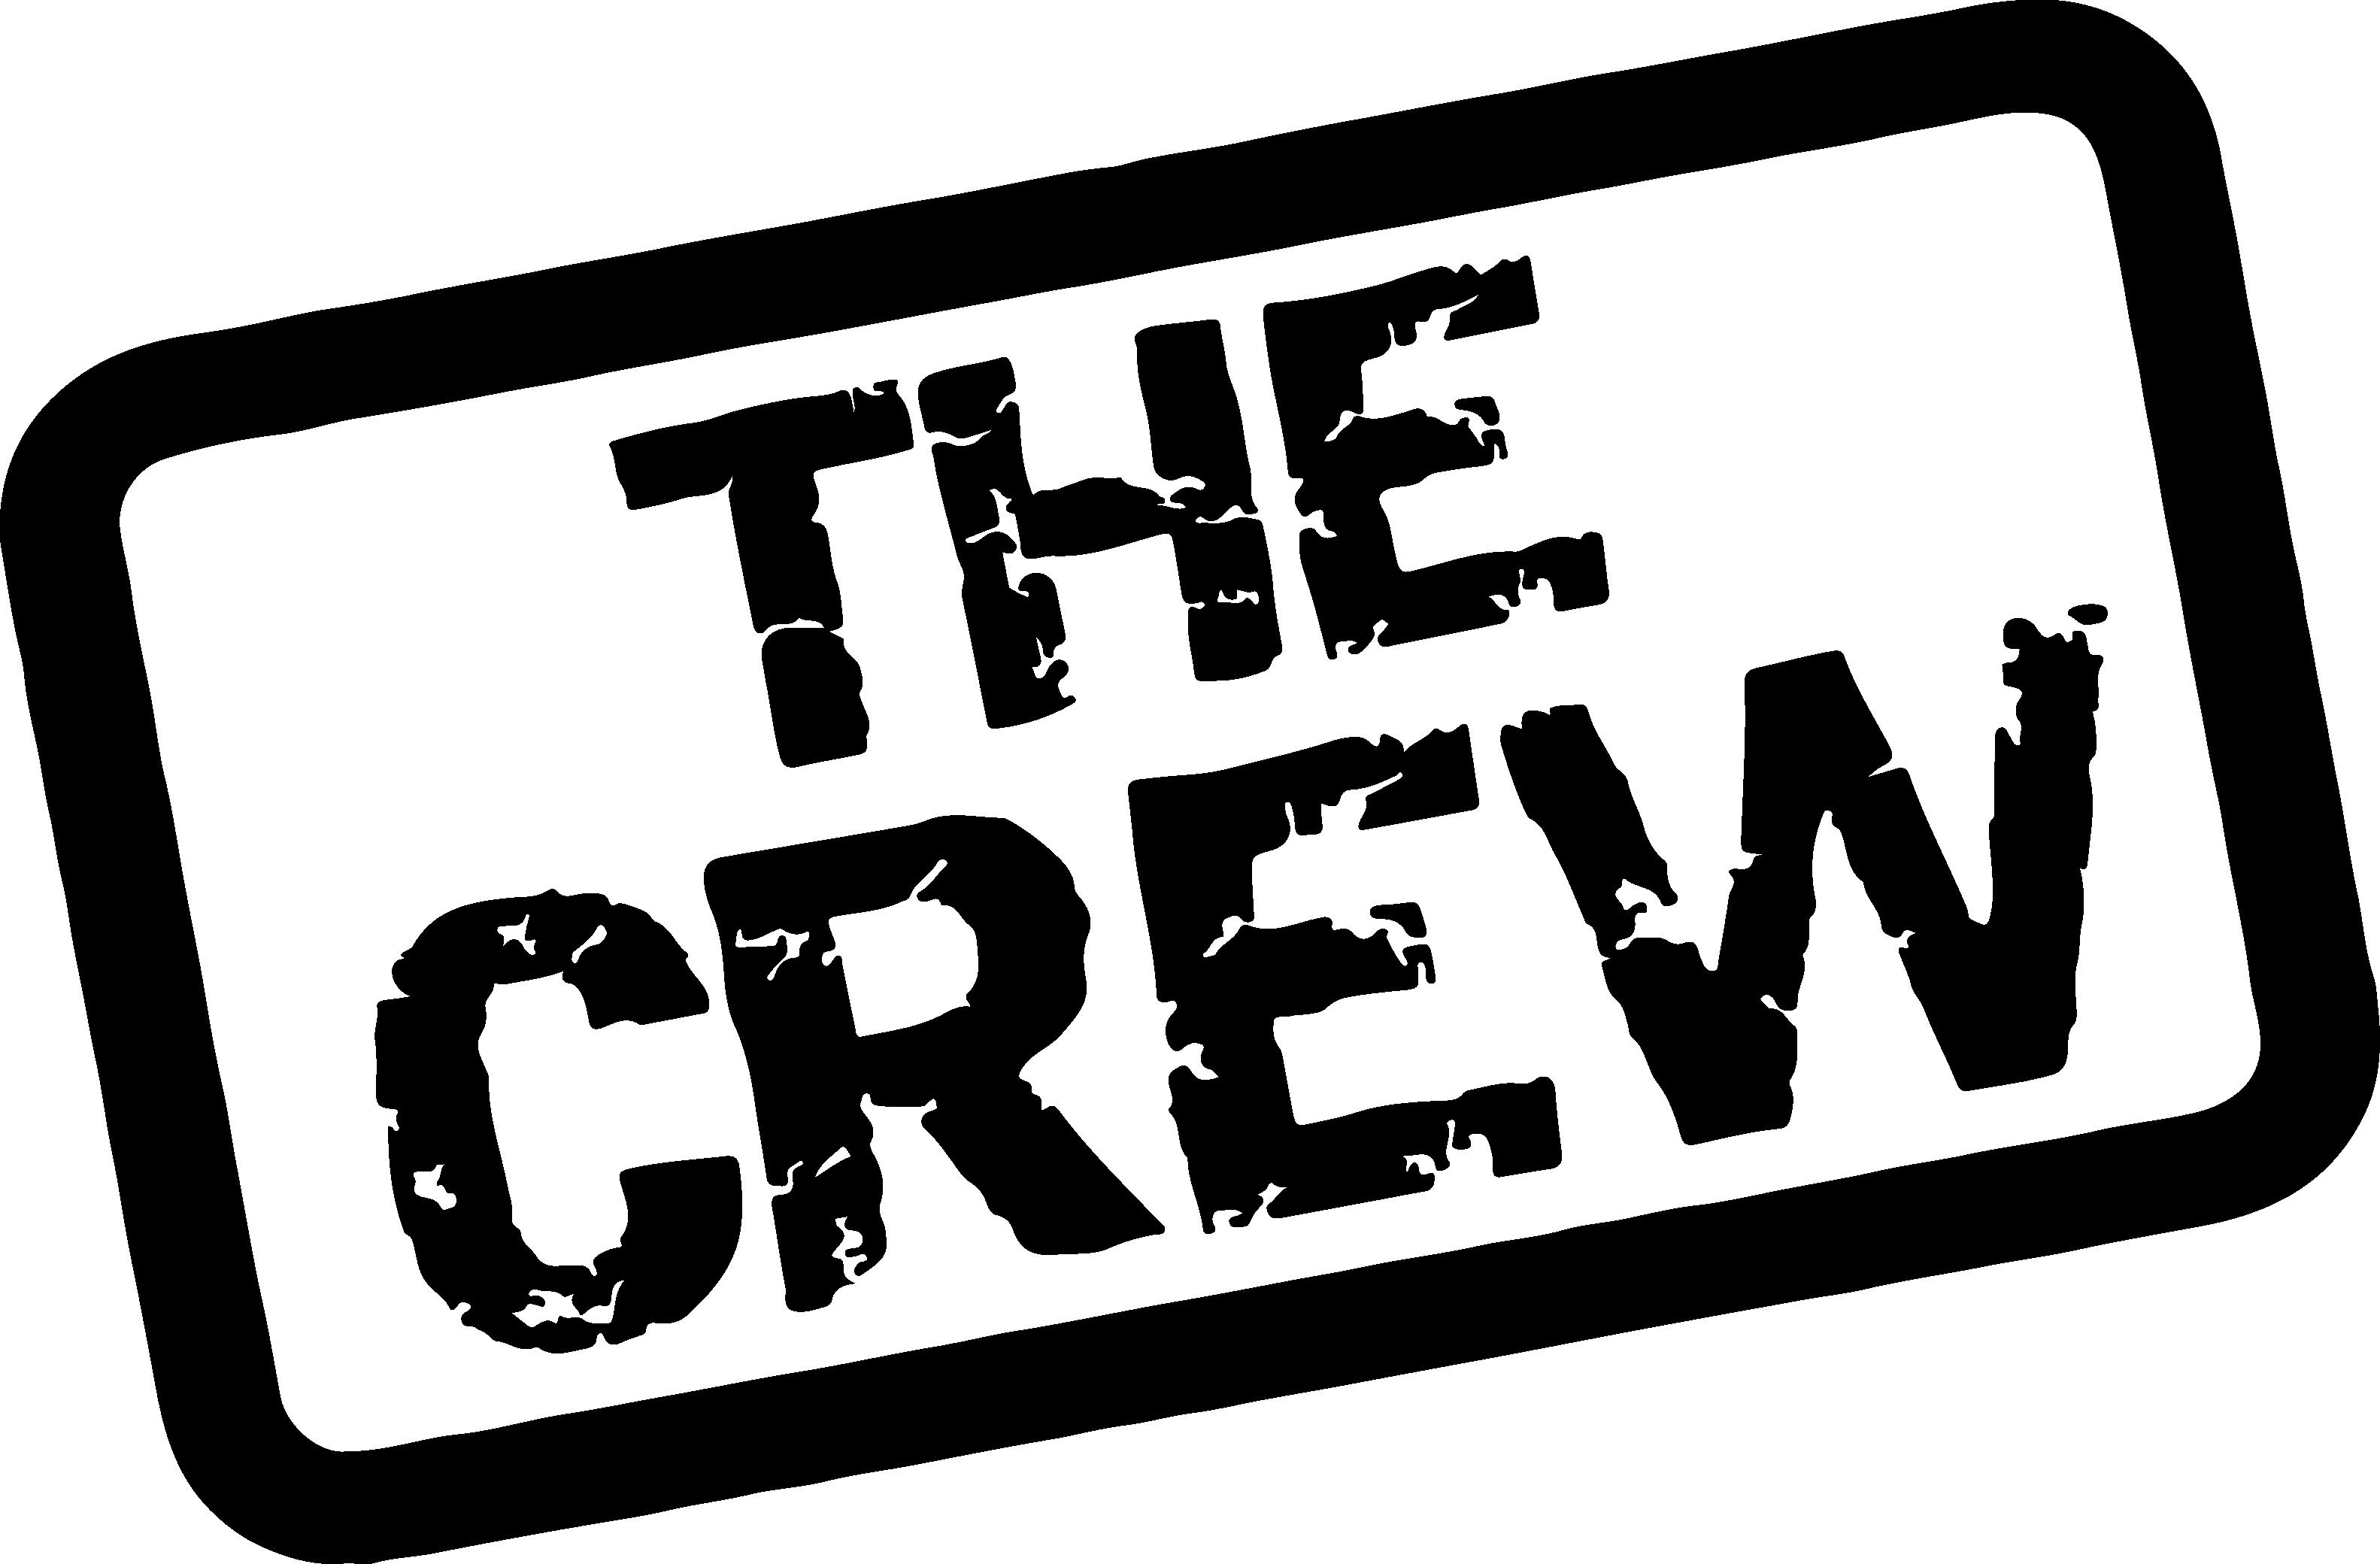 The crew logo . Dinner clipart meal plan